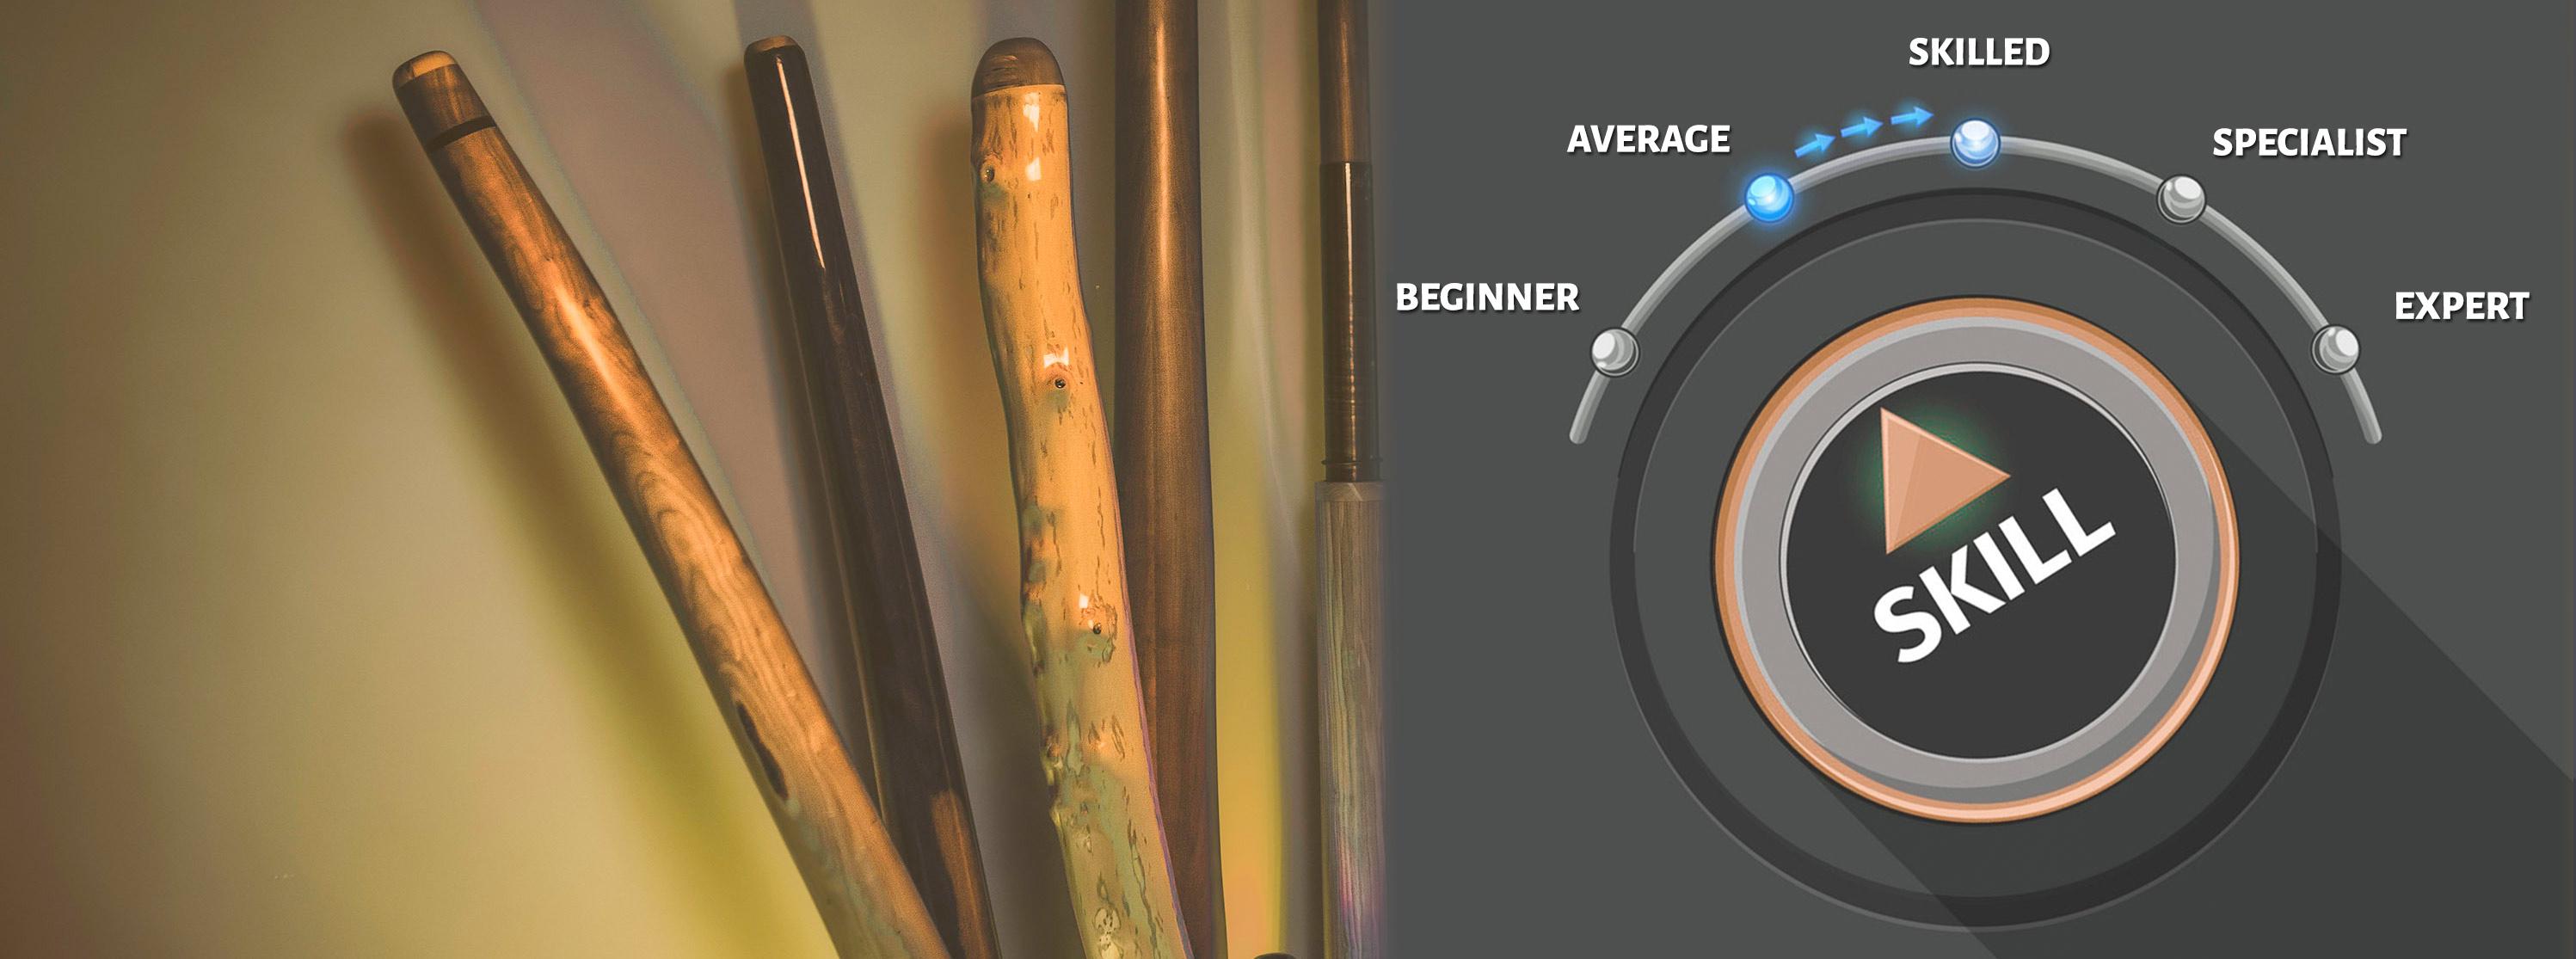 Beatbox - The Didgeridoo Enhancer